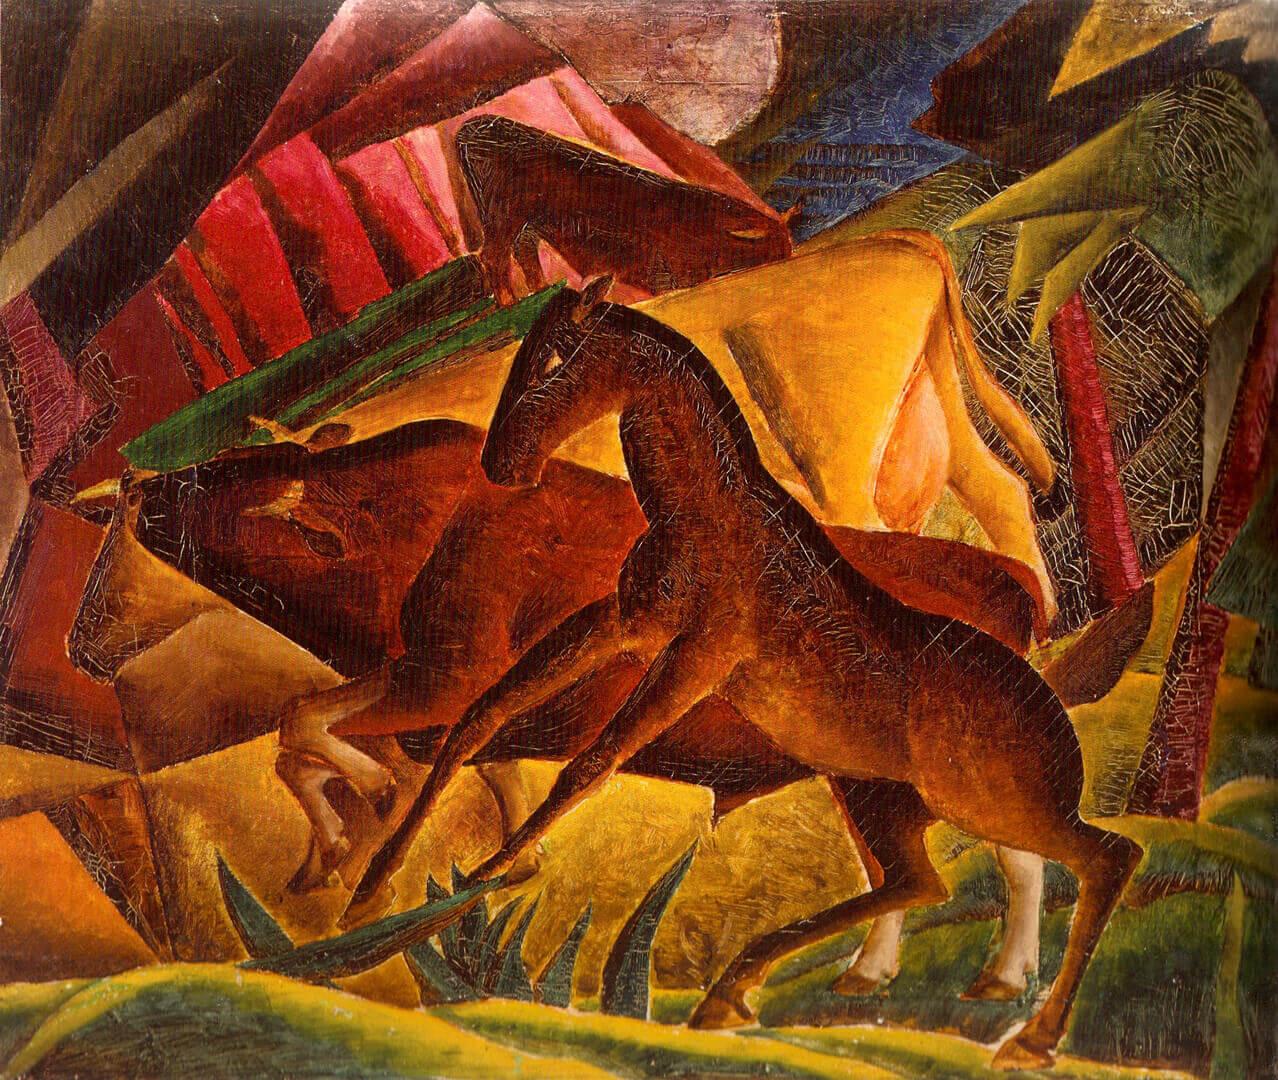 Kathleen Munn, Composition (Horses), c. 1927